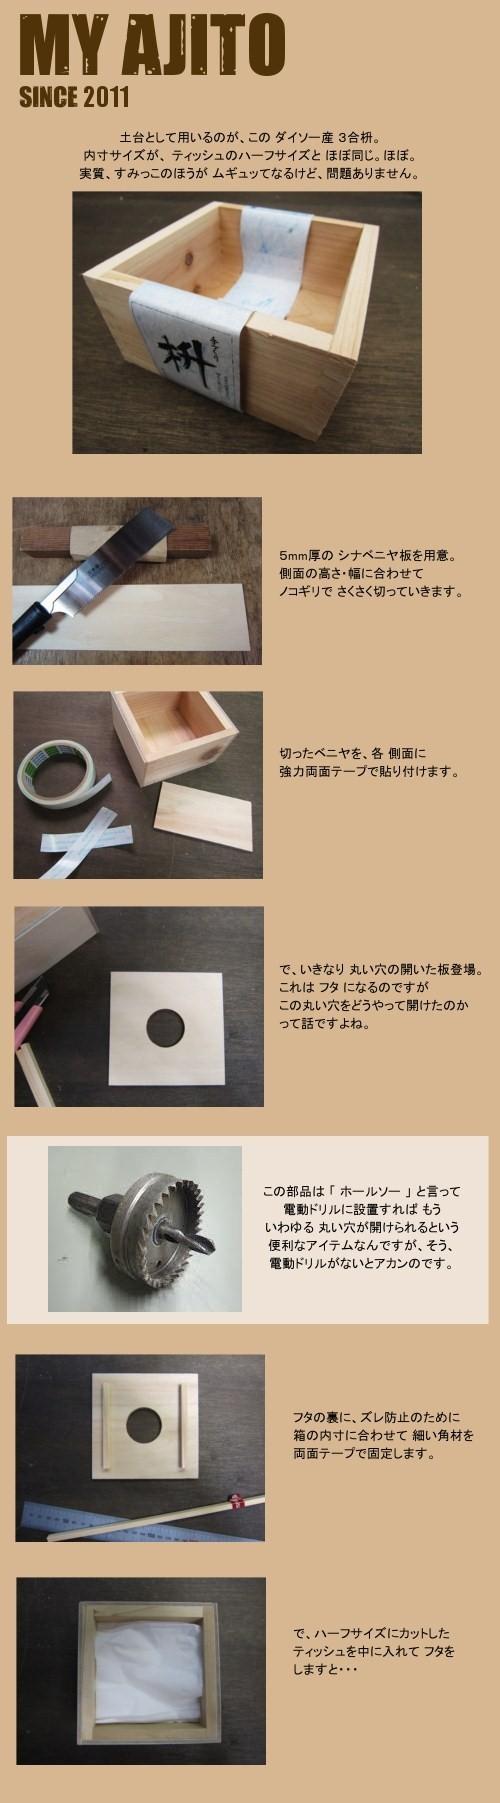 th_05.jpg